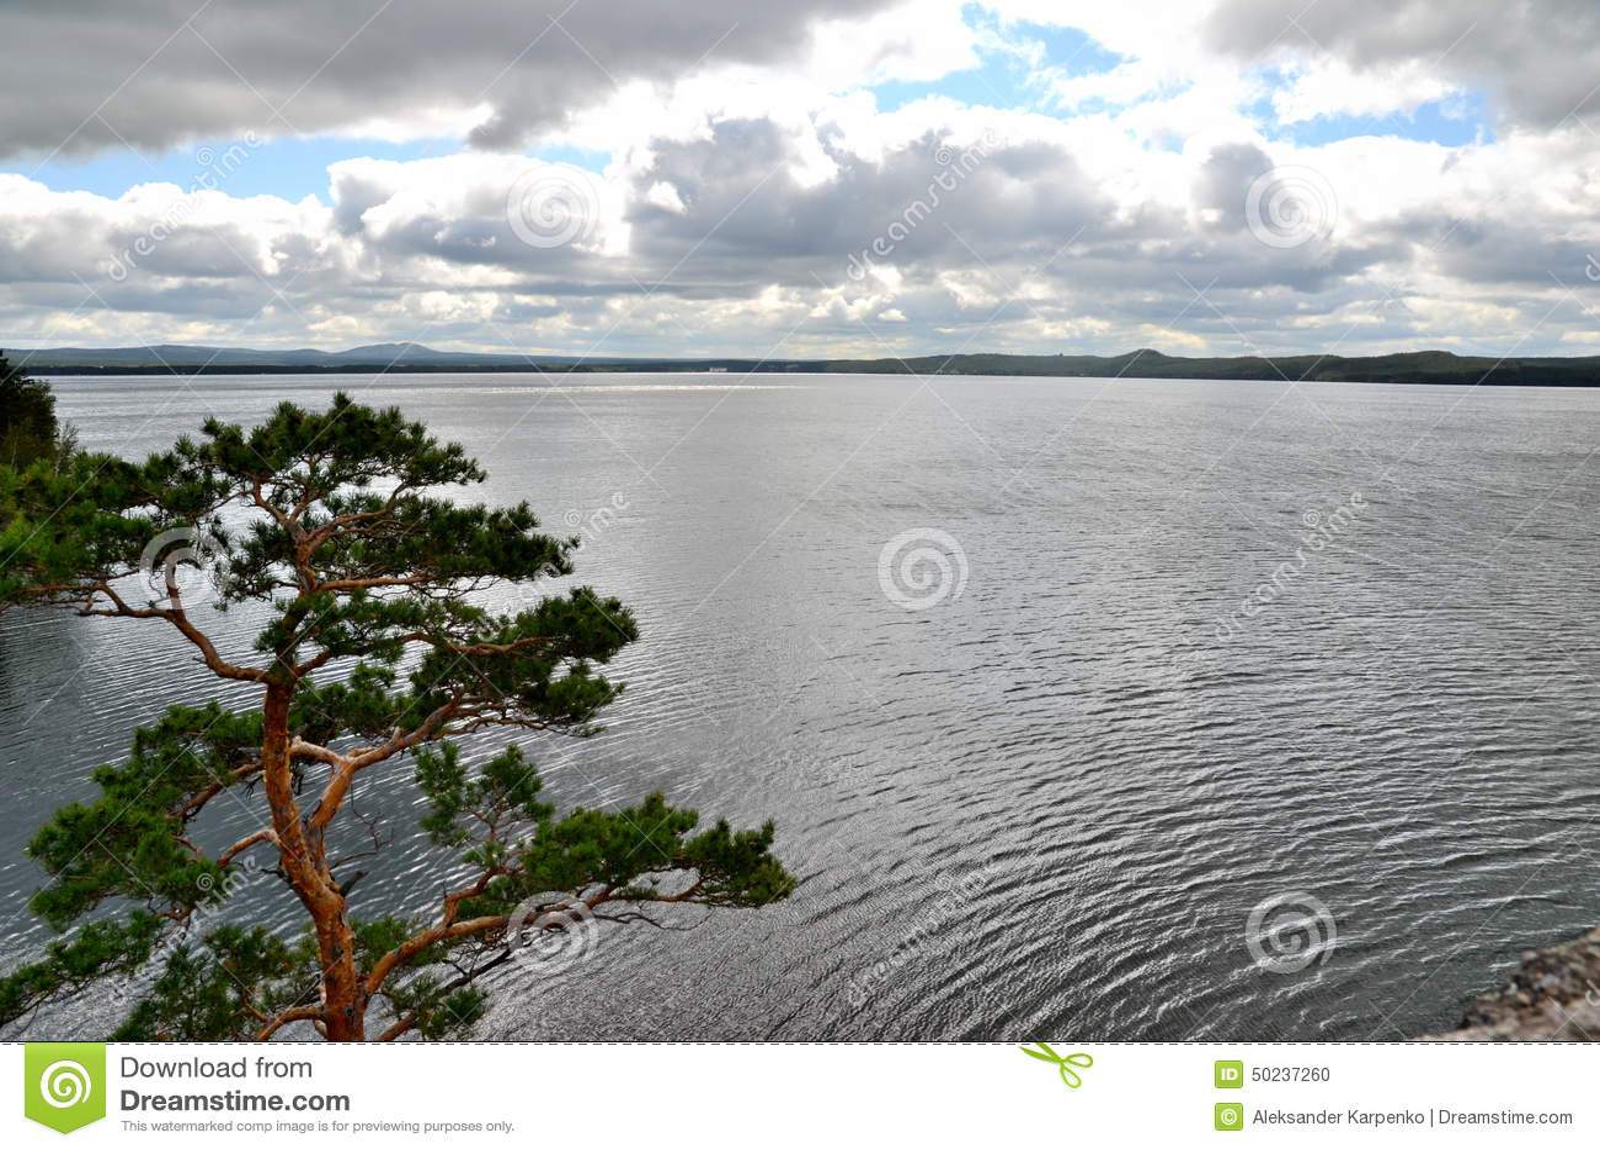 Borovoe Kazakhstan  city images : Lake Borovoe, State National Natural Park Burabai, Kazakhstan.